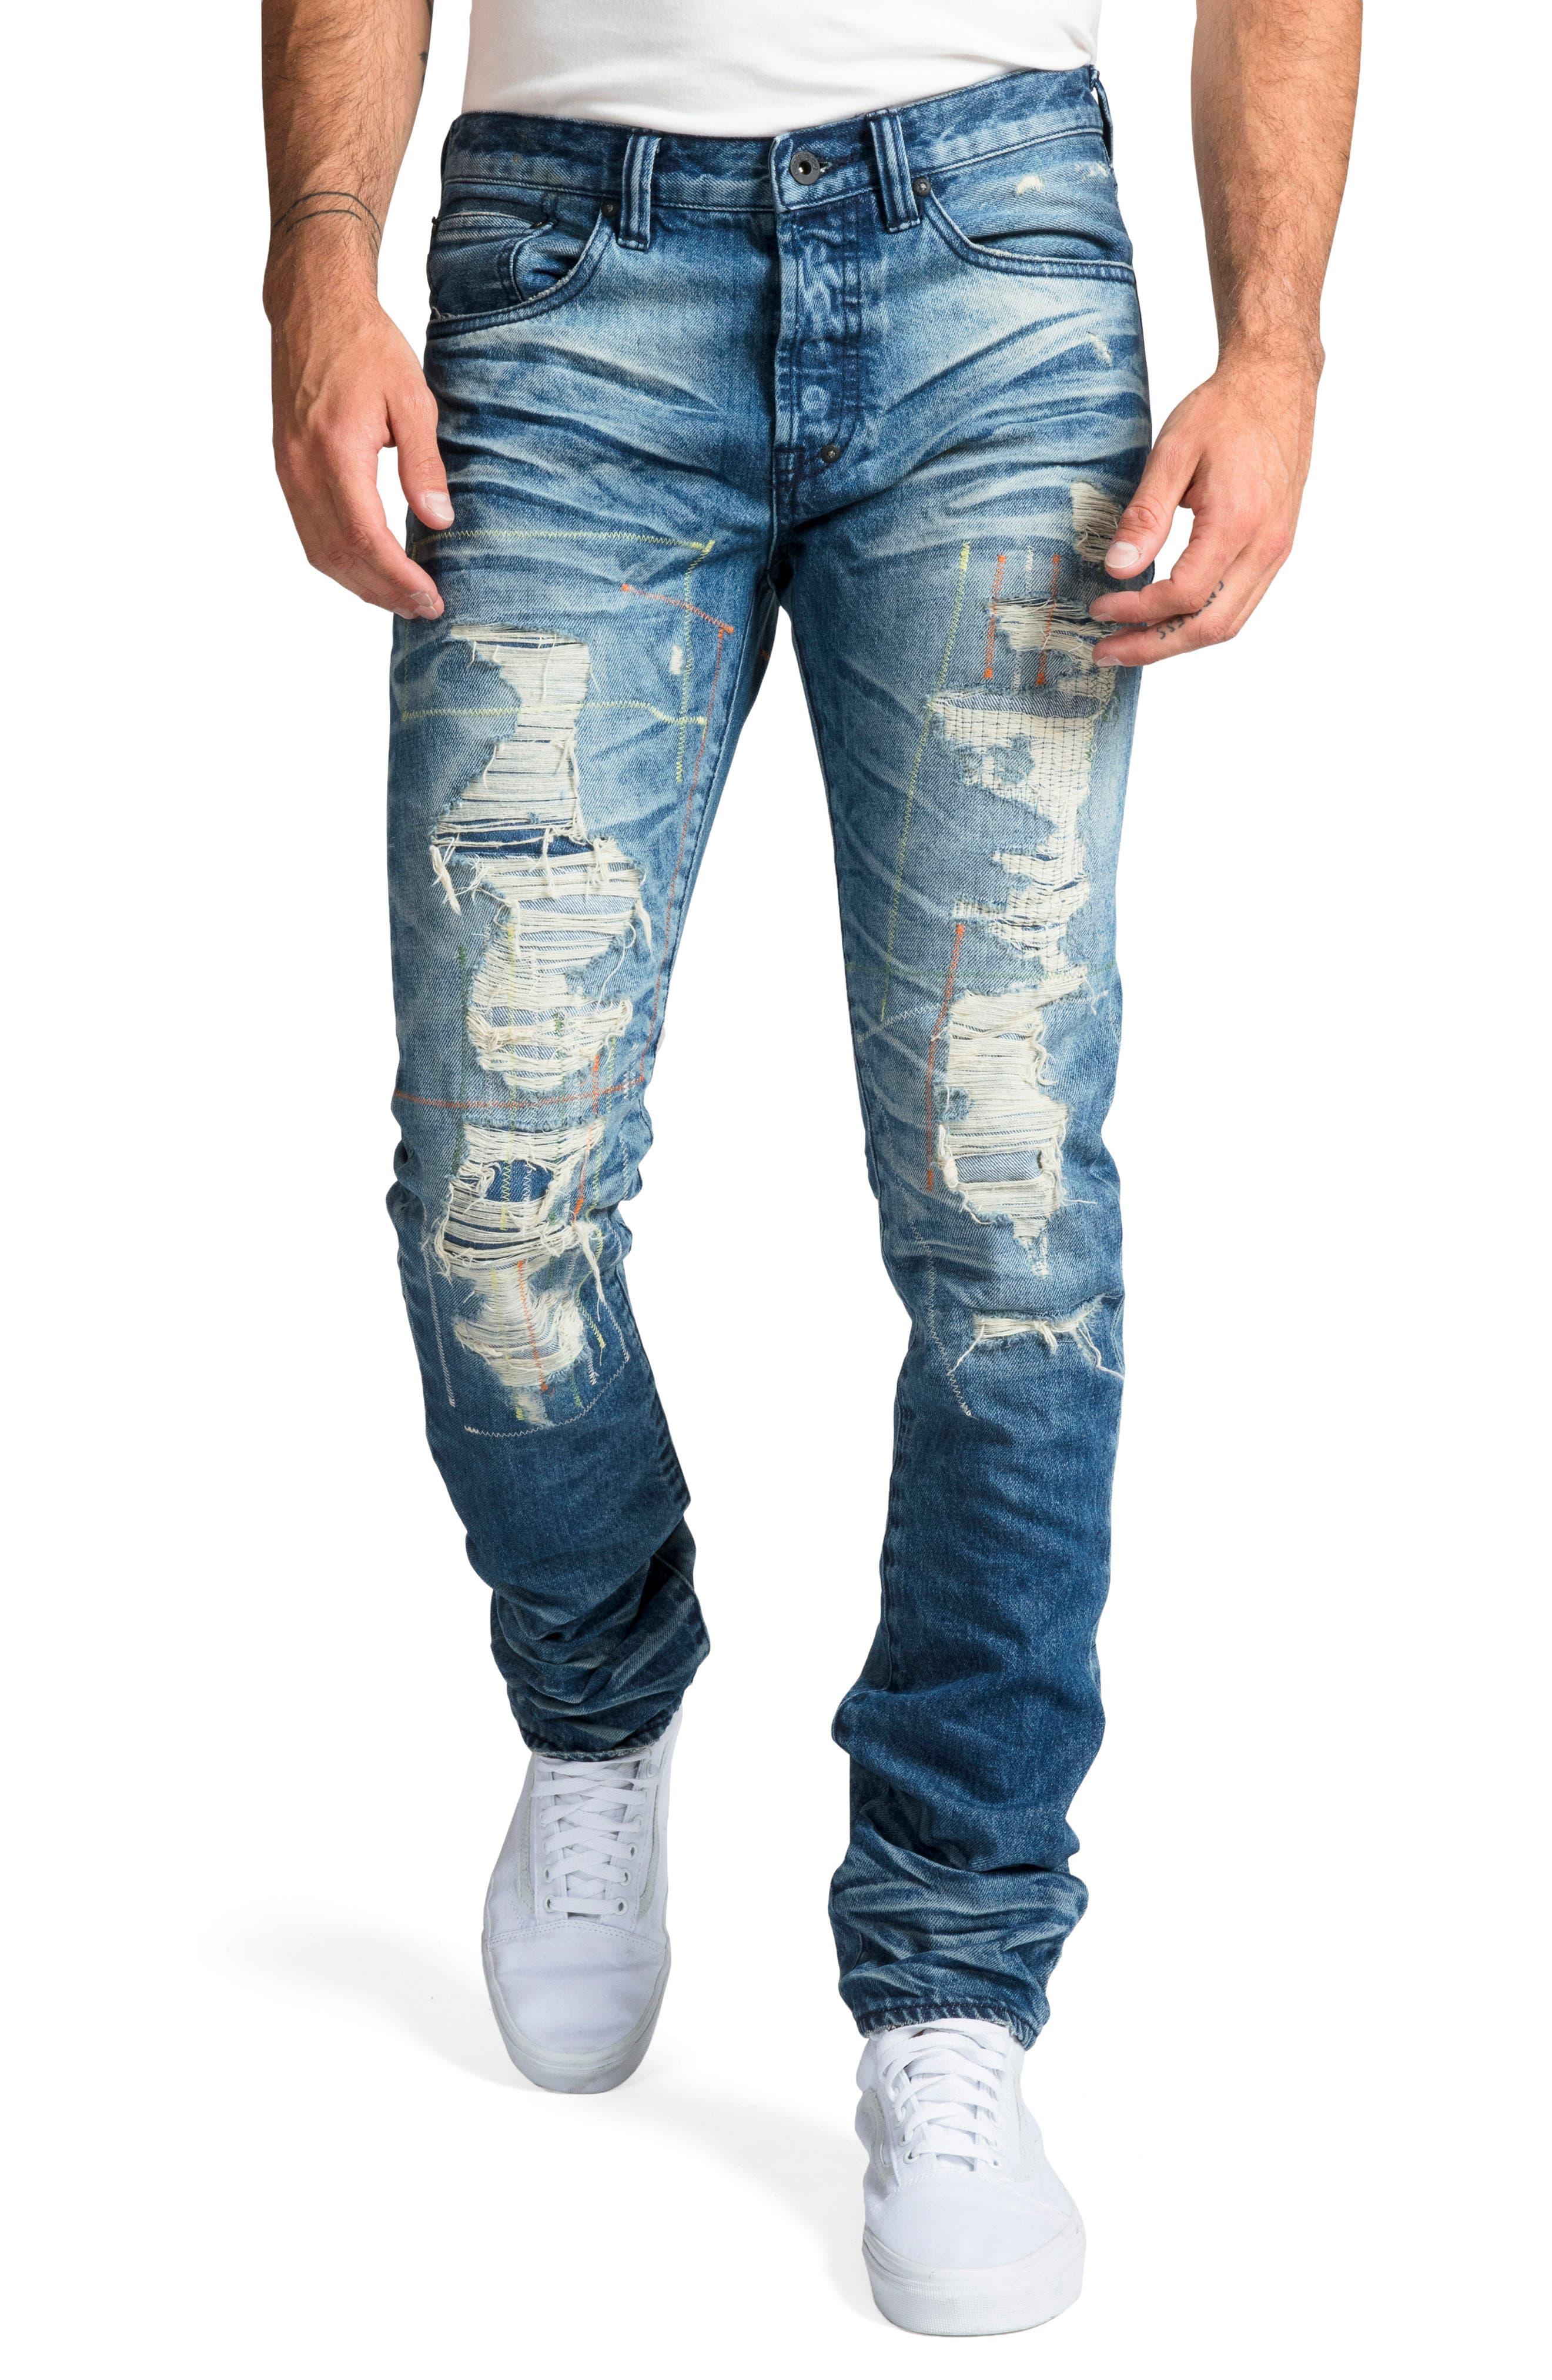 Le Sabre Slim Fit Jeans,                         Main,                         color, COOING